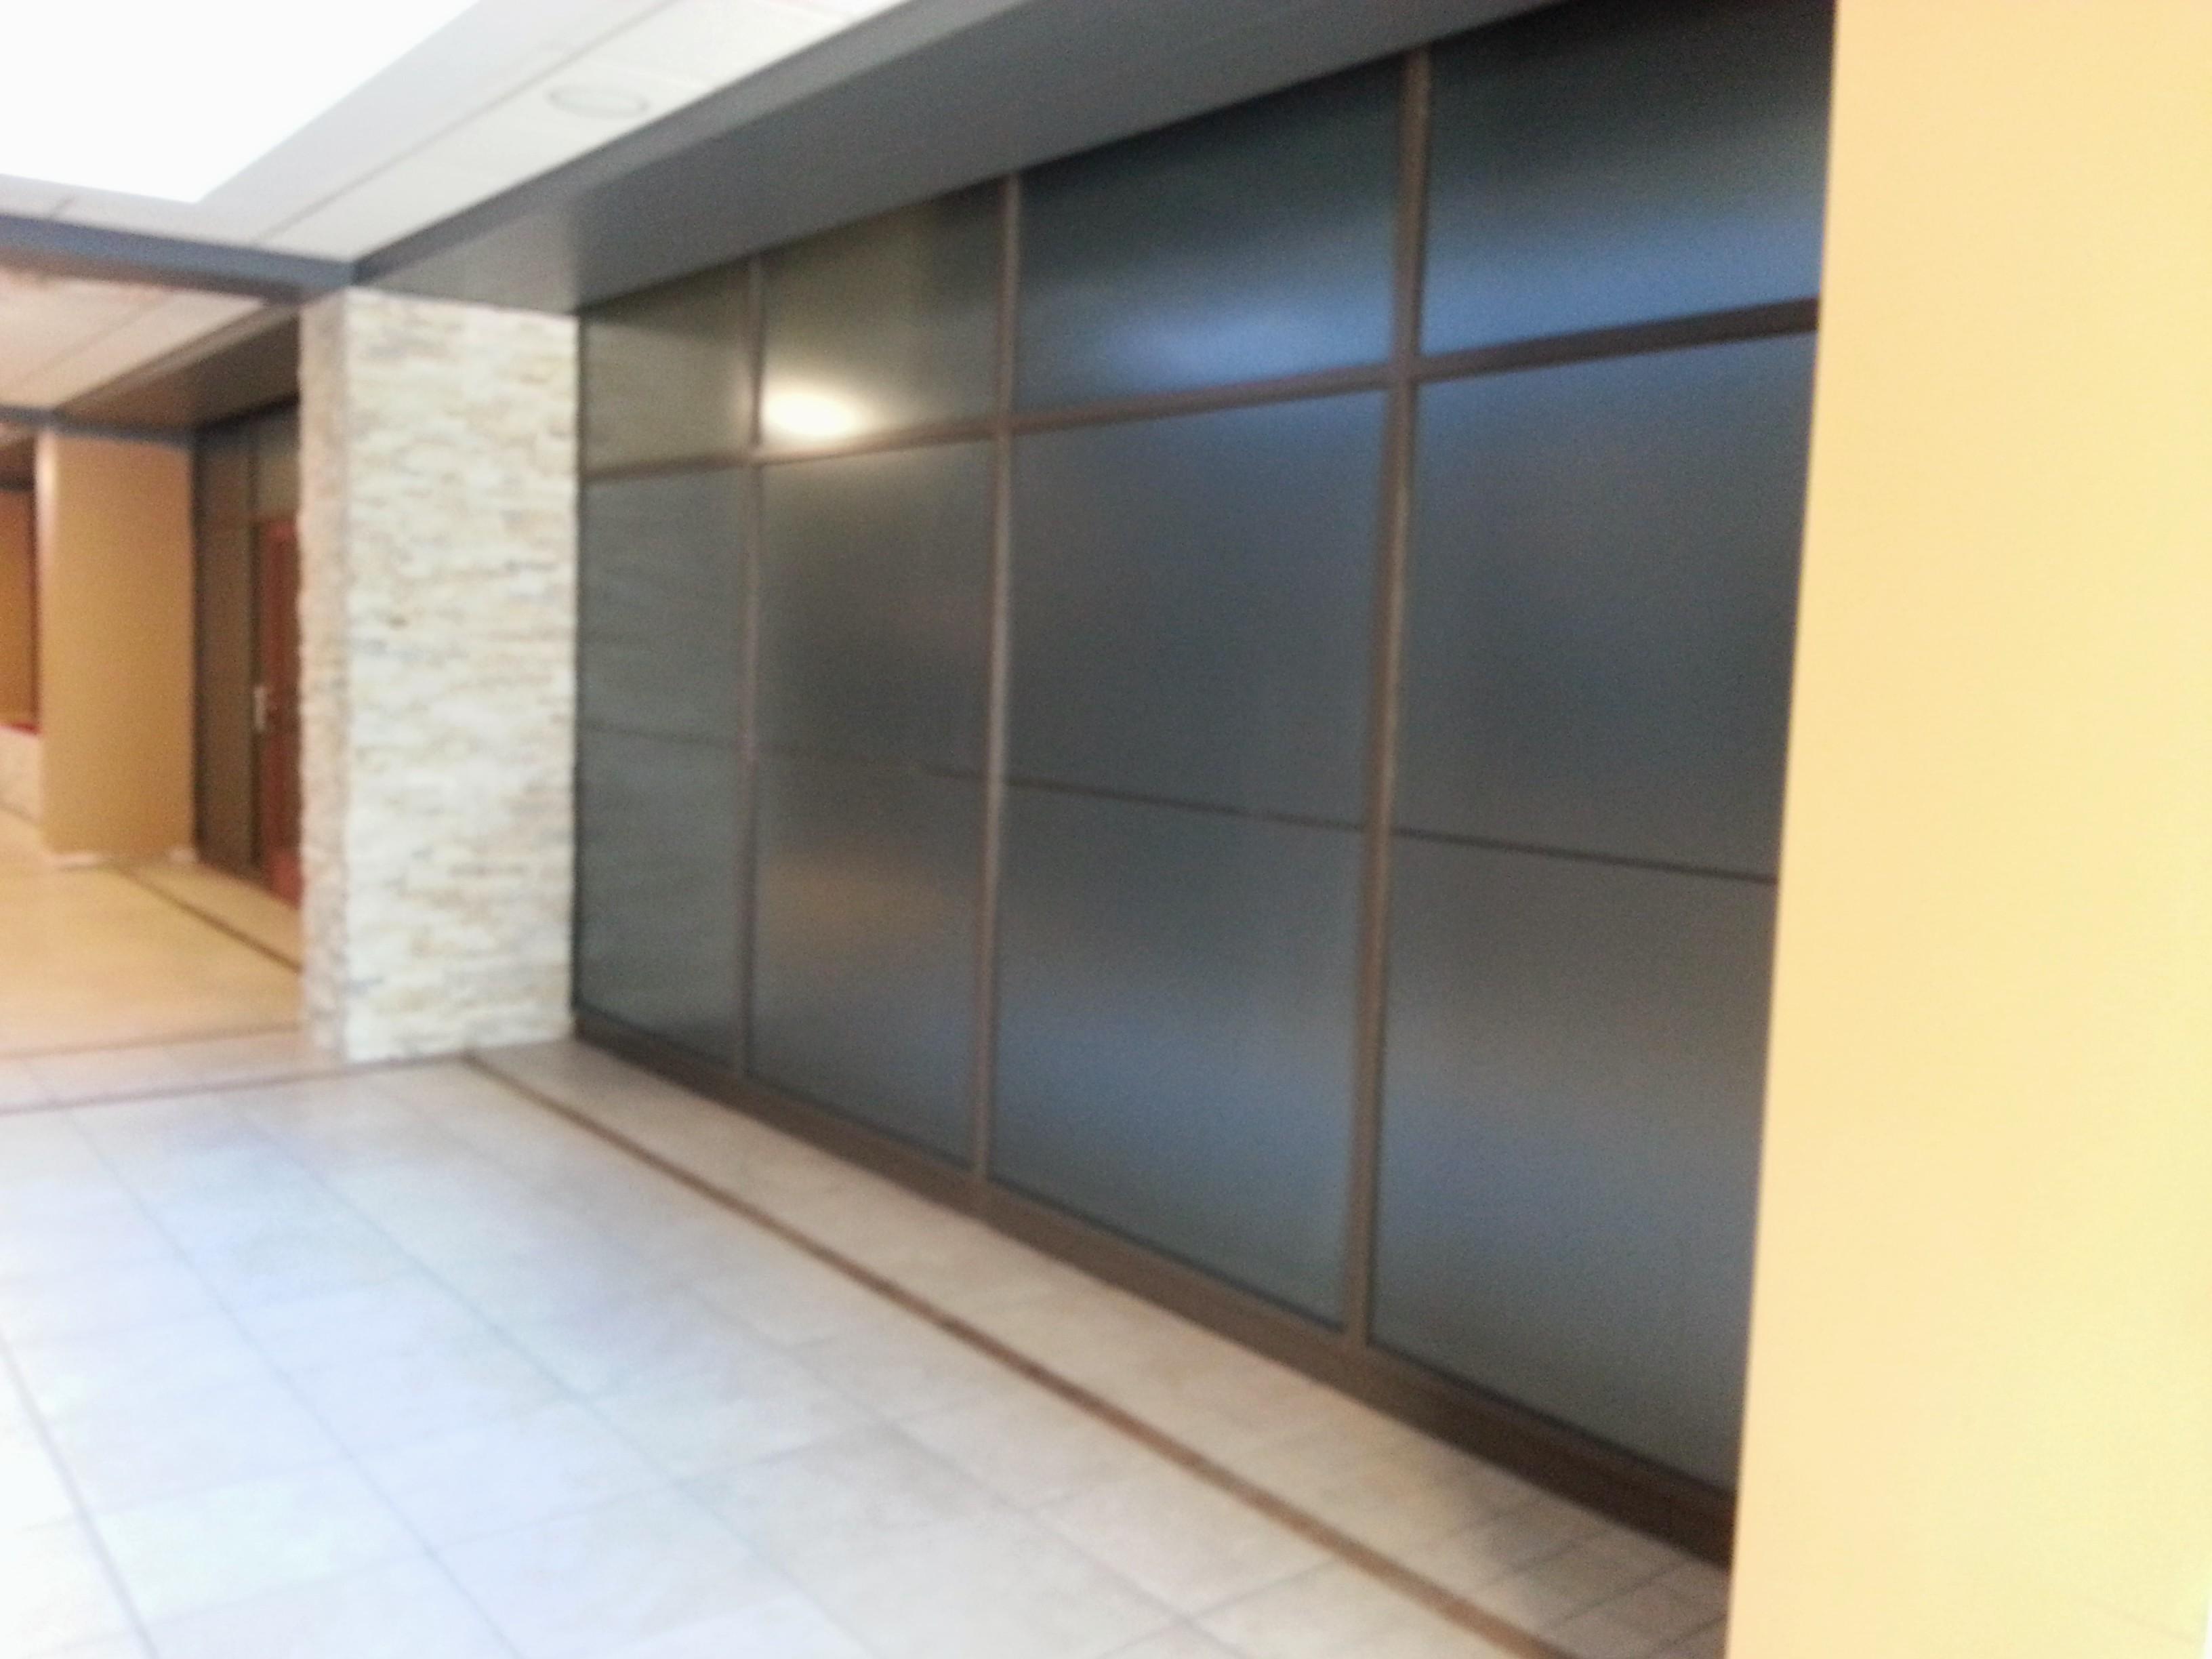 Window Tinting Mn >> Decorative Window Films and Installation - Minneapolis, St ...